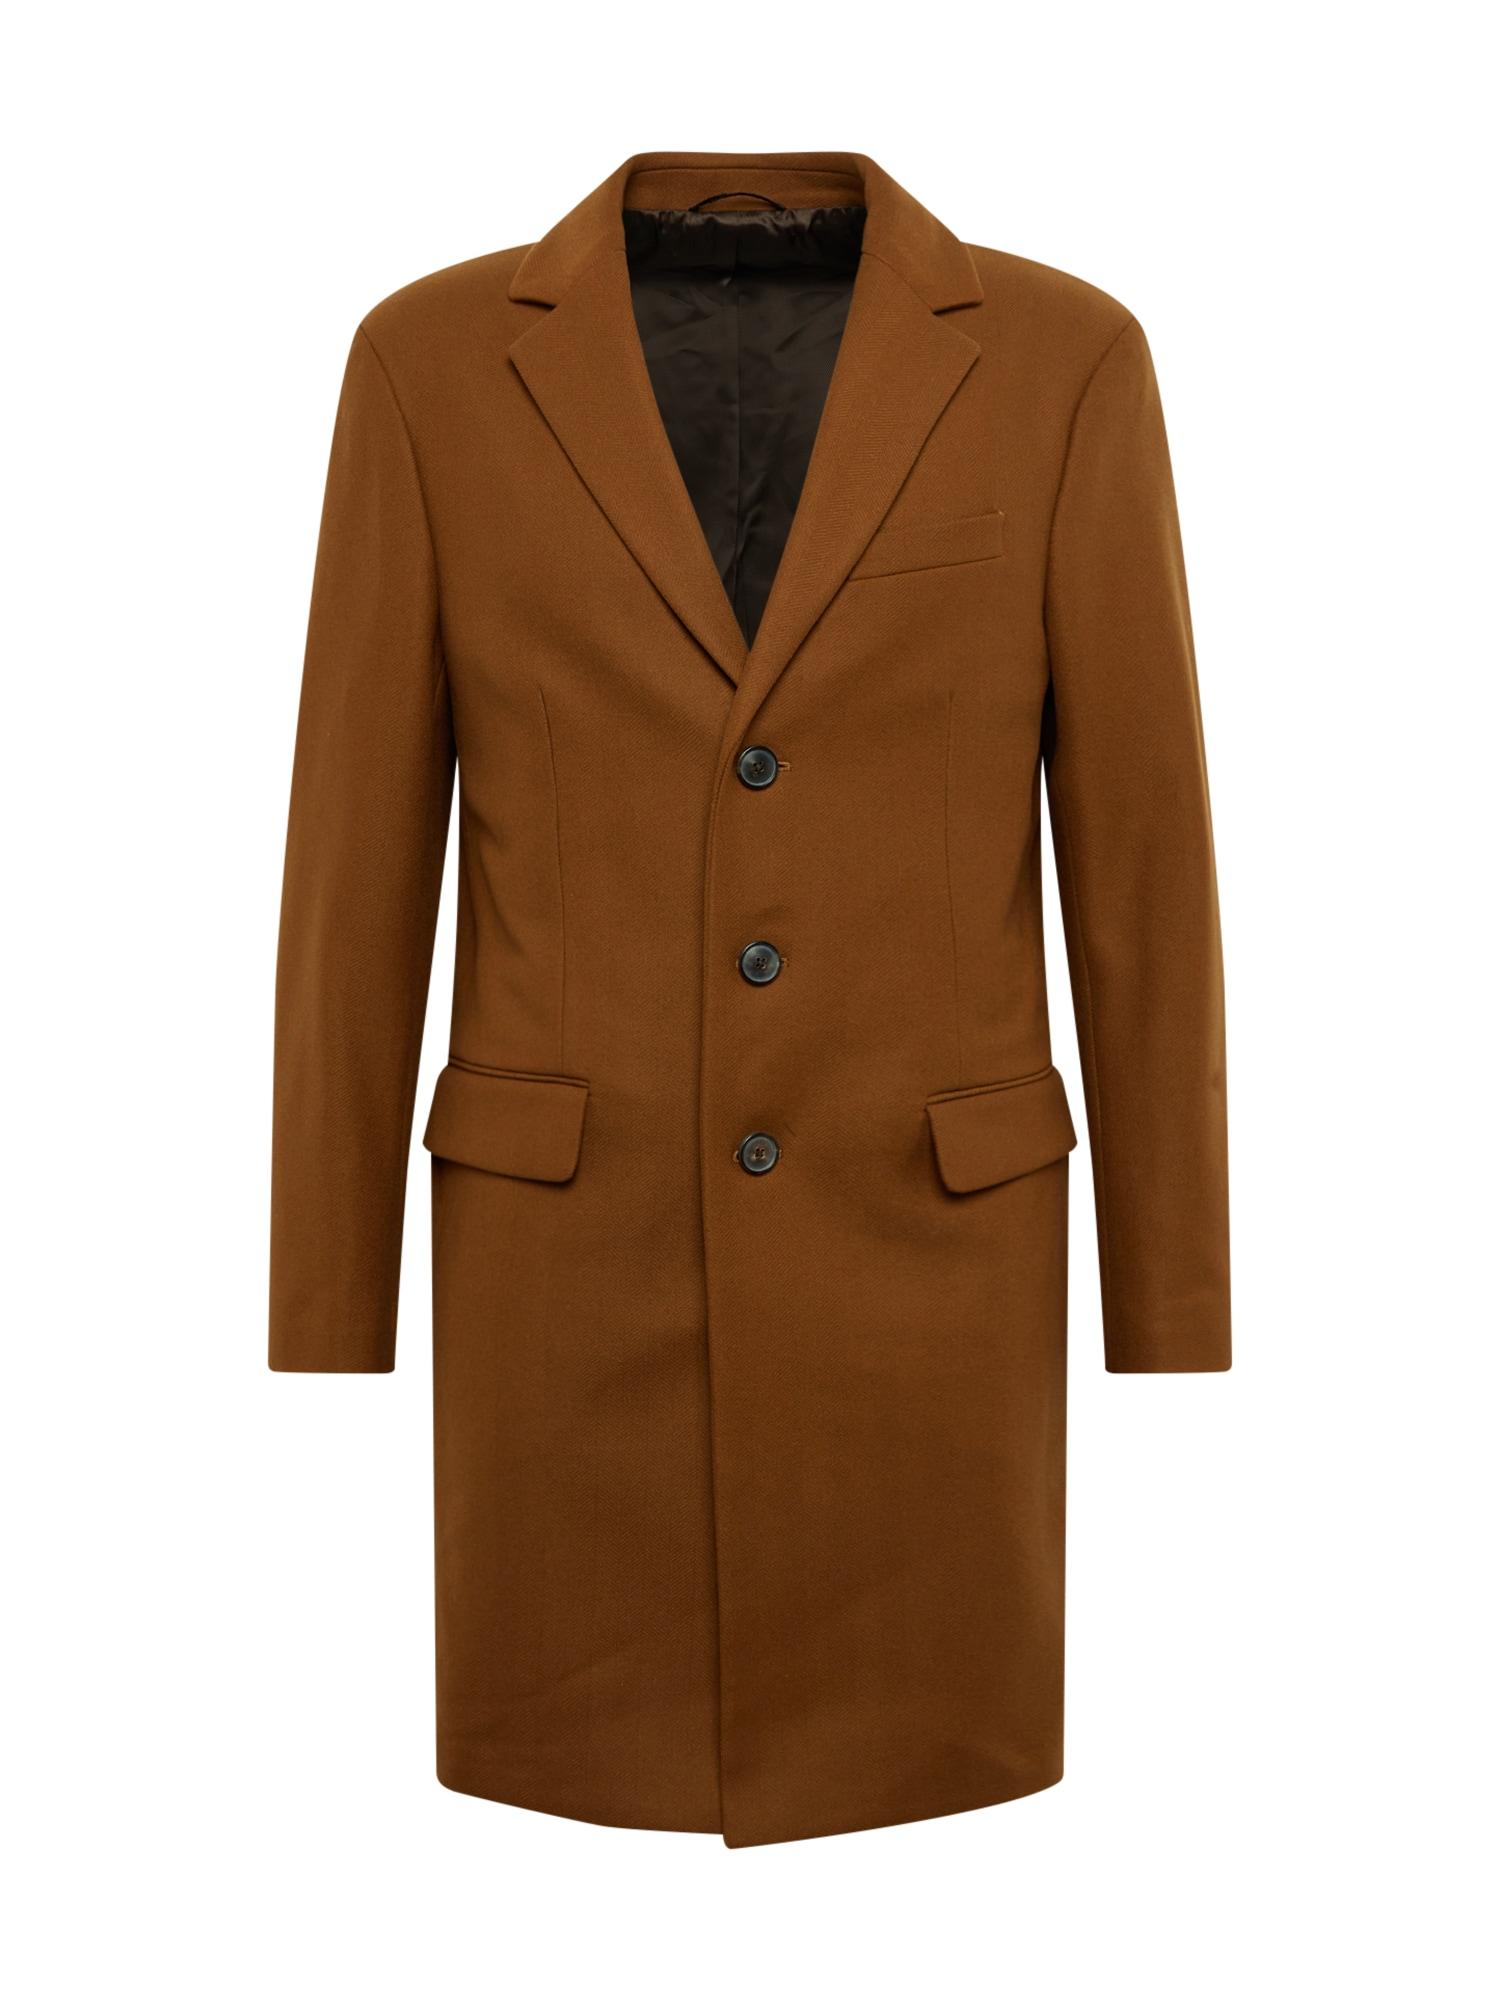 Banana Republic Rudeninis-žieminis paltas 'WOOL CASHMERE BLEND HERRINGBONE TOPCOAT' ruda